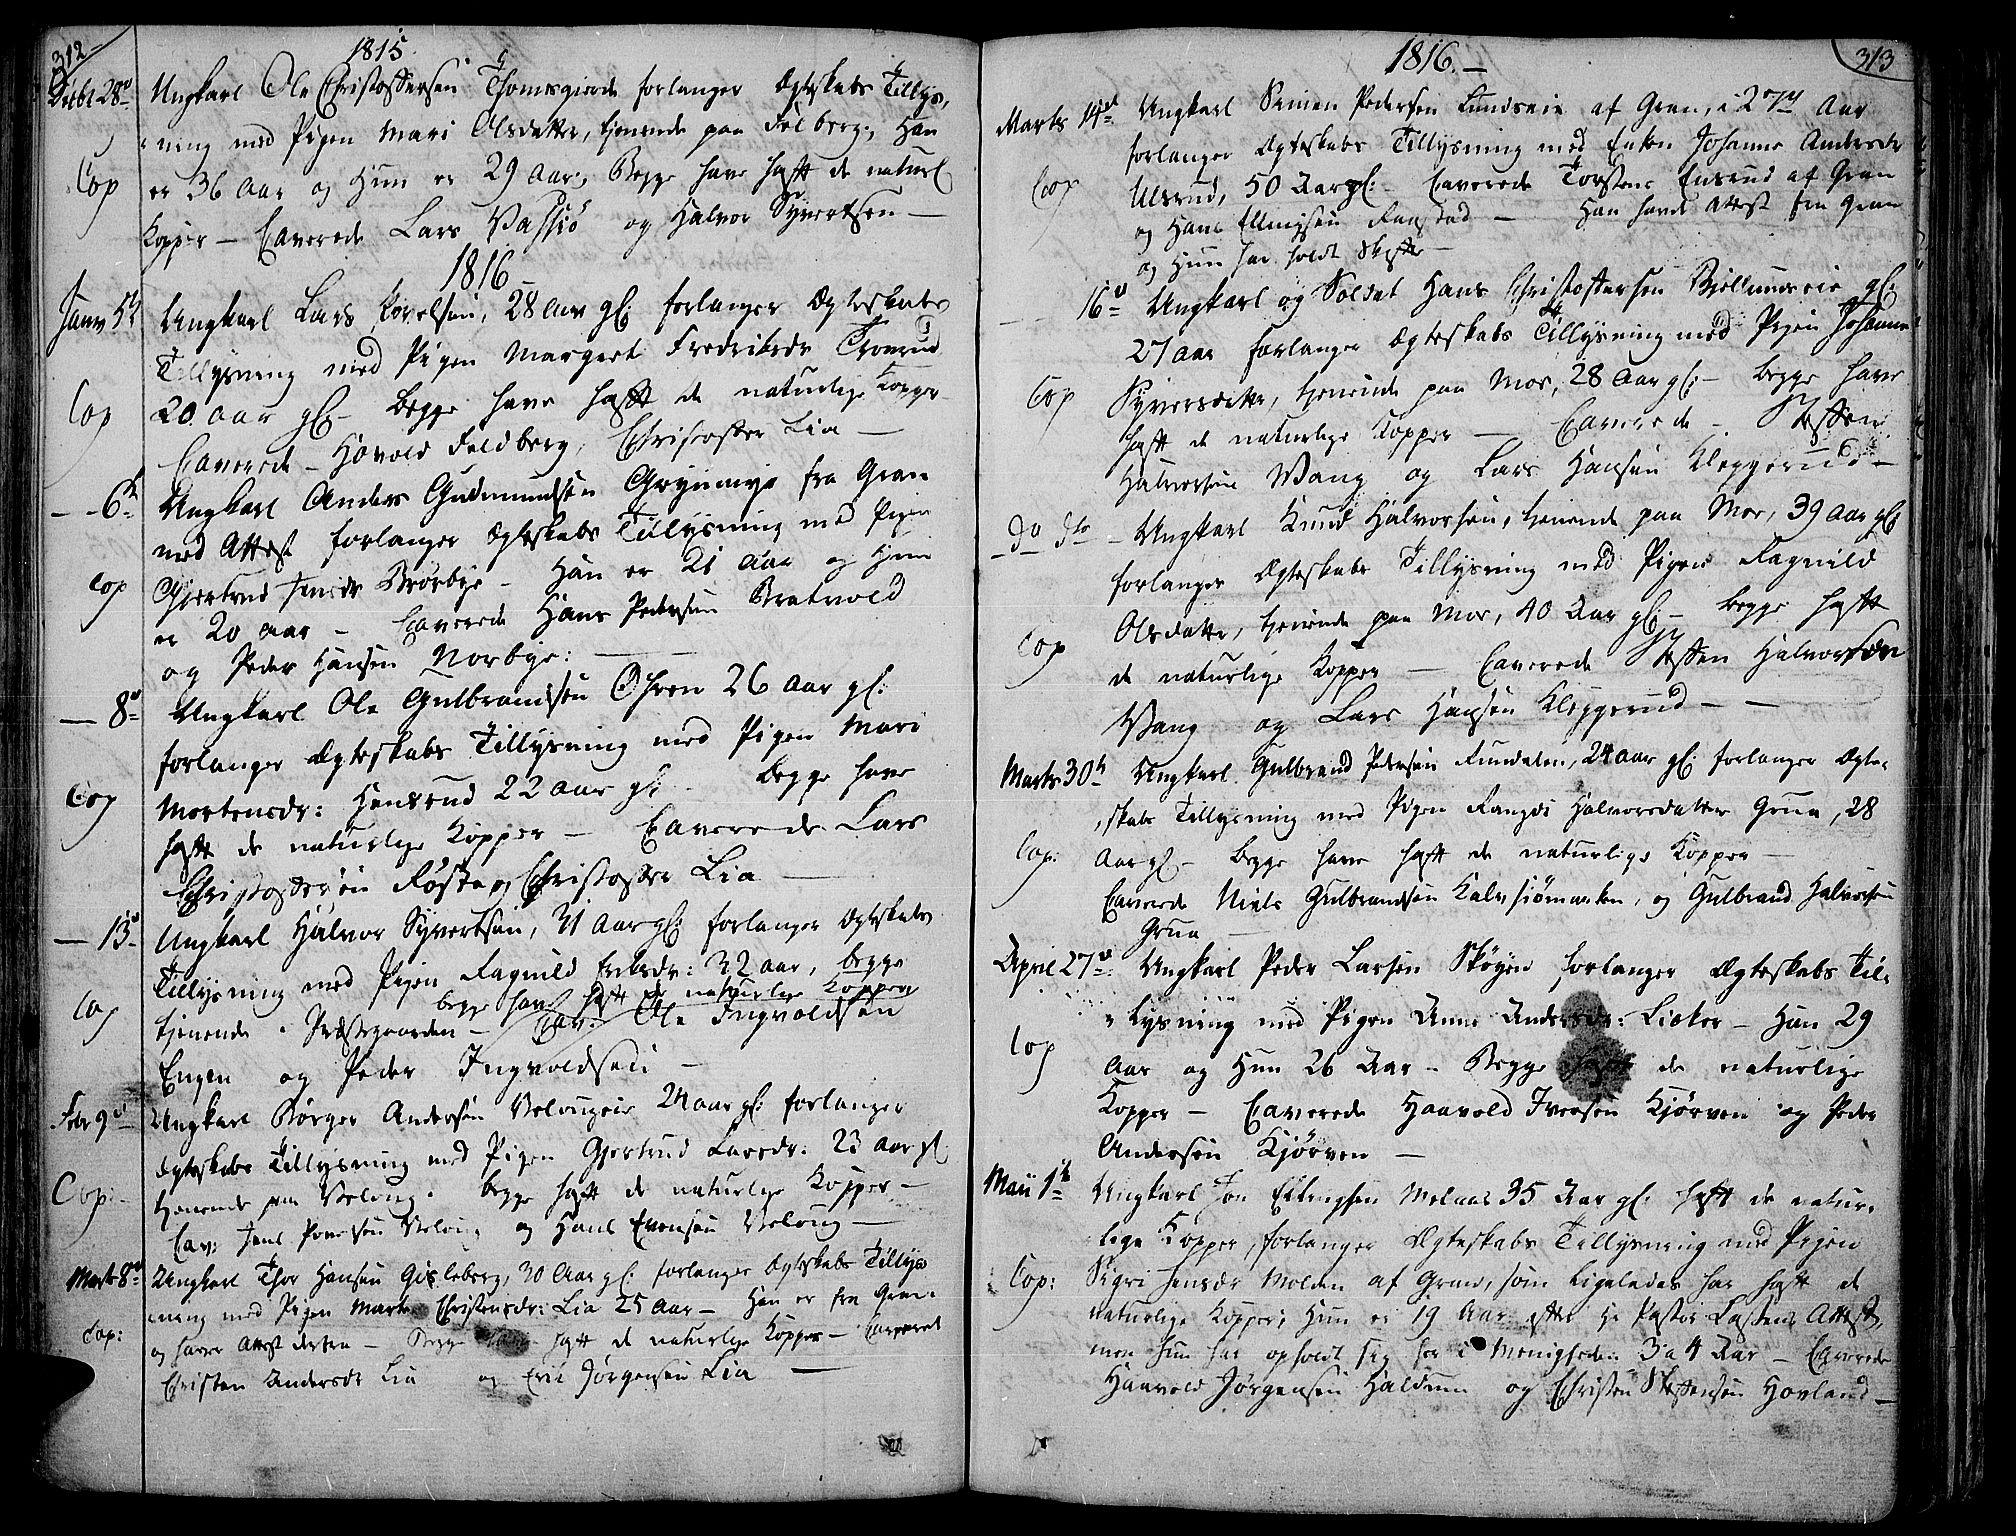 SAH, Jevnaker prestekontor, Ministerialbok nr. 4, 1800-1861, s. 312-313